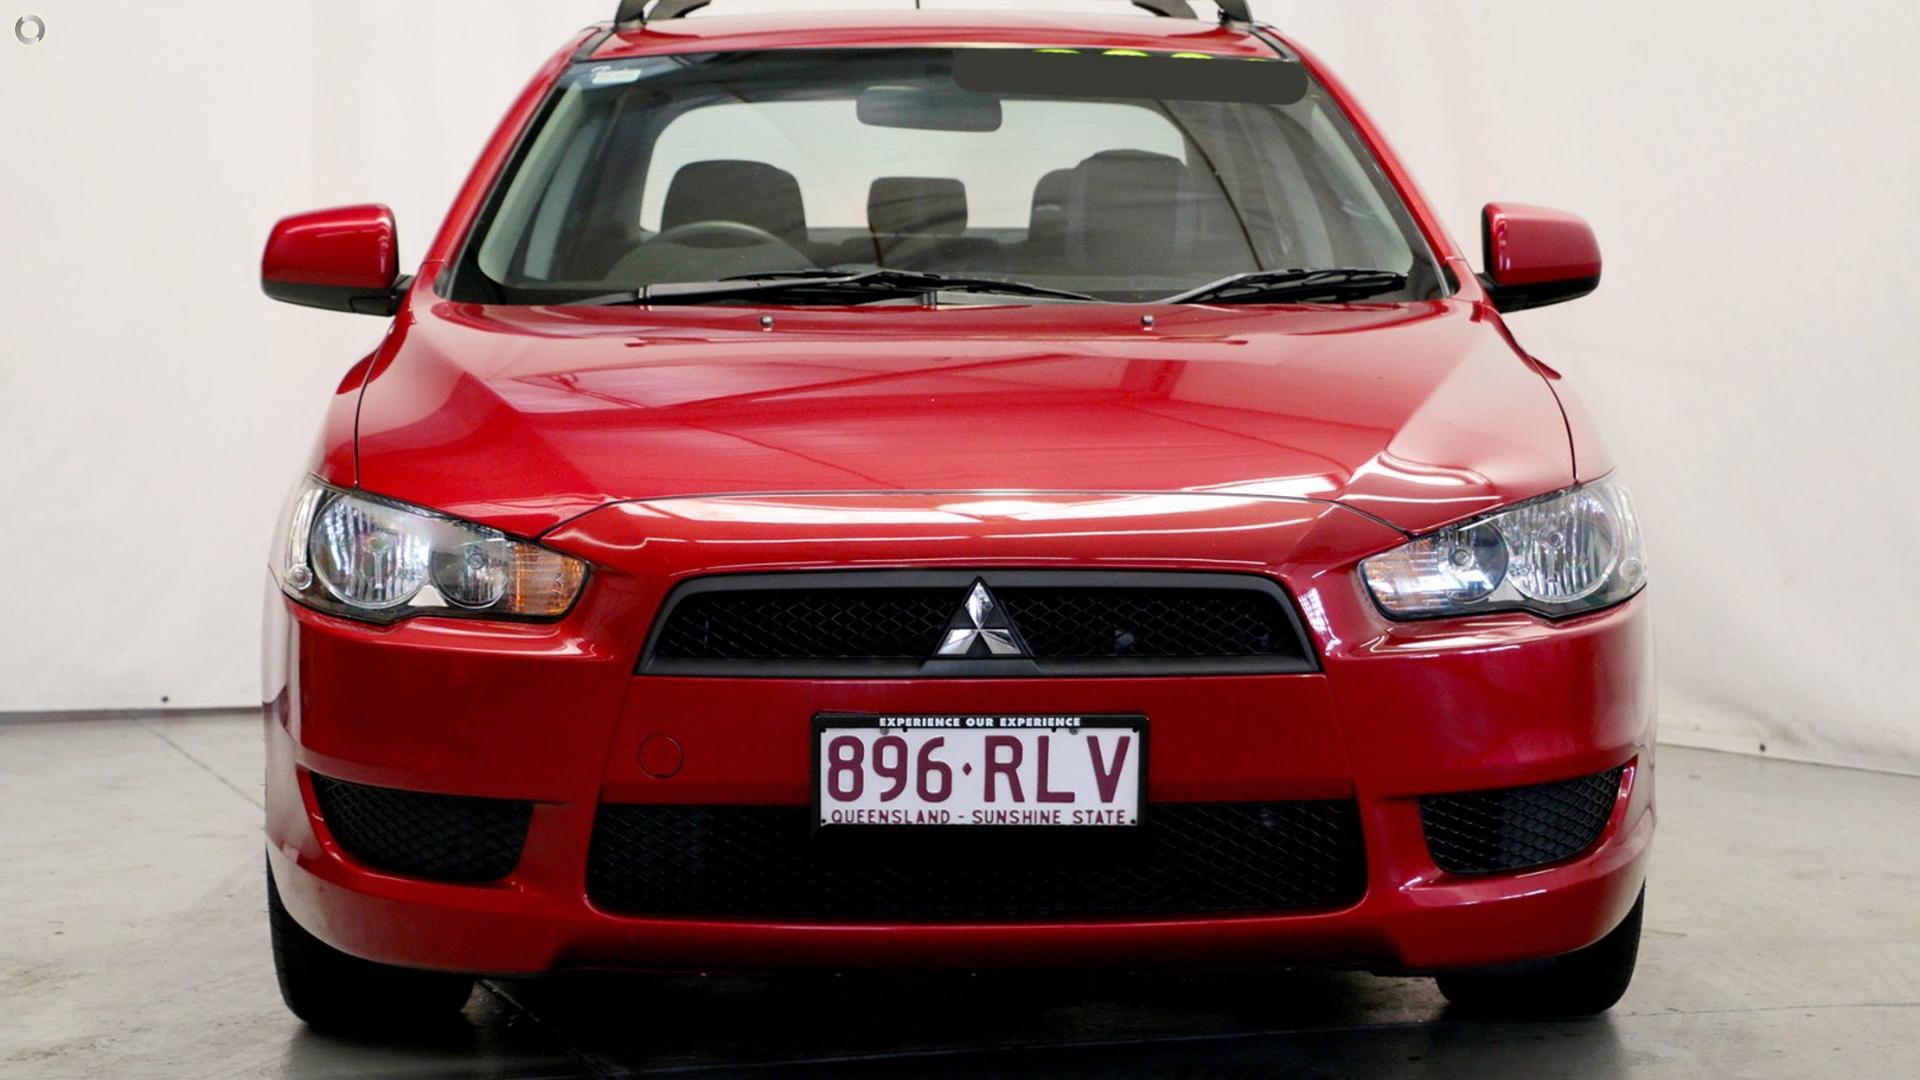 2010 Mitsubishi Lancer ES CJ